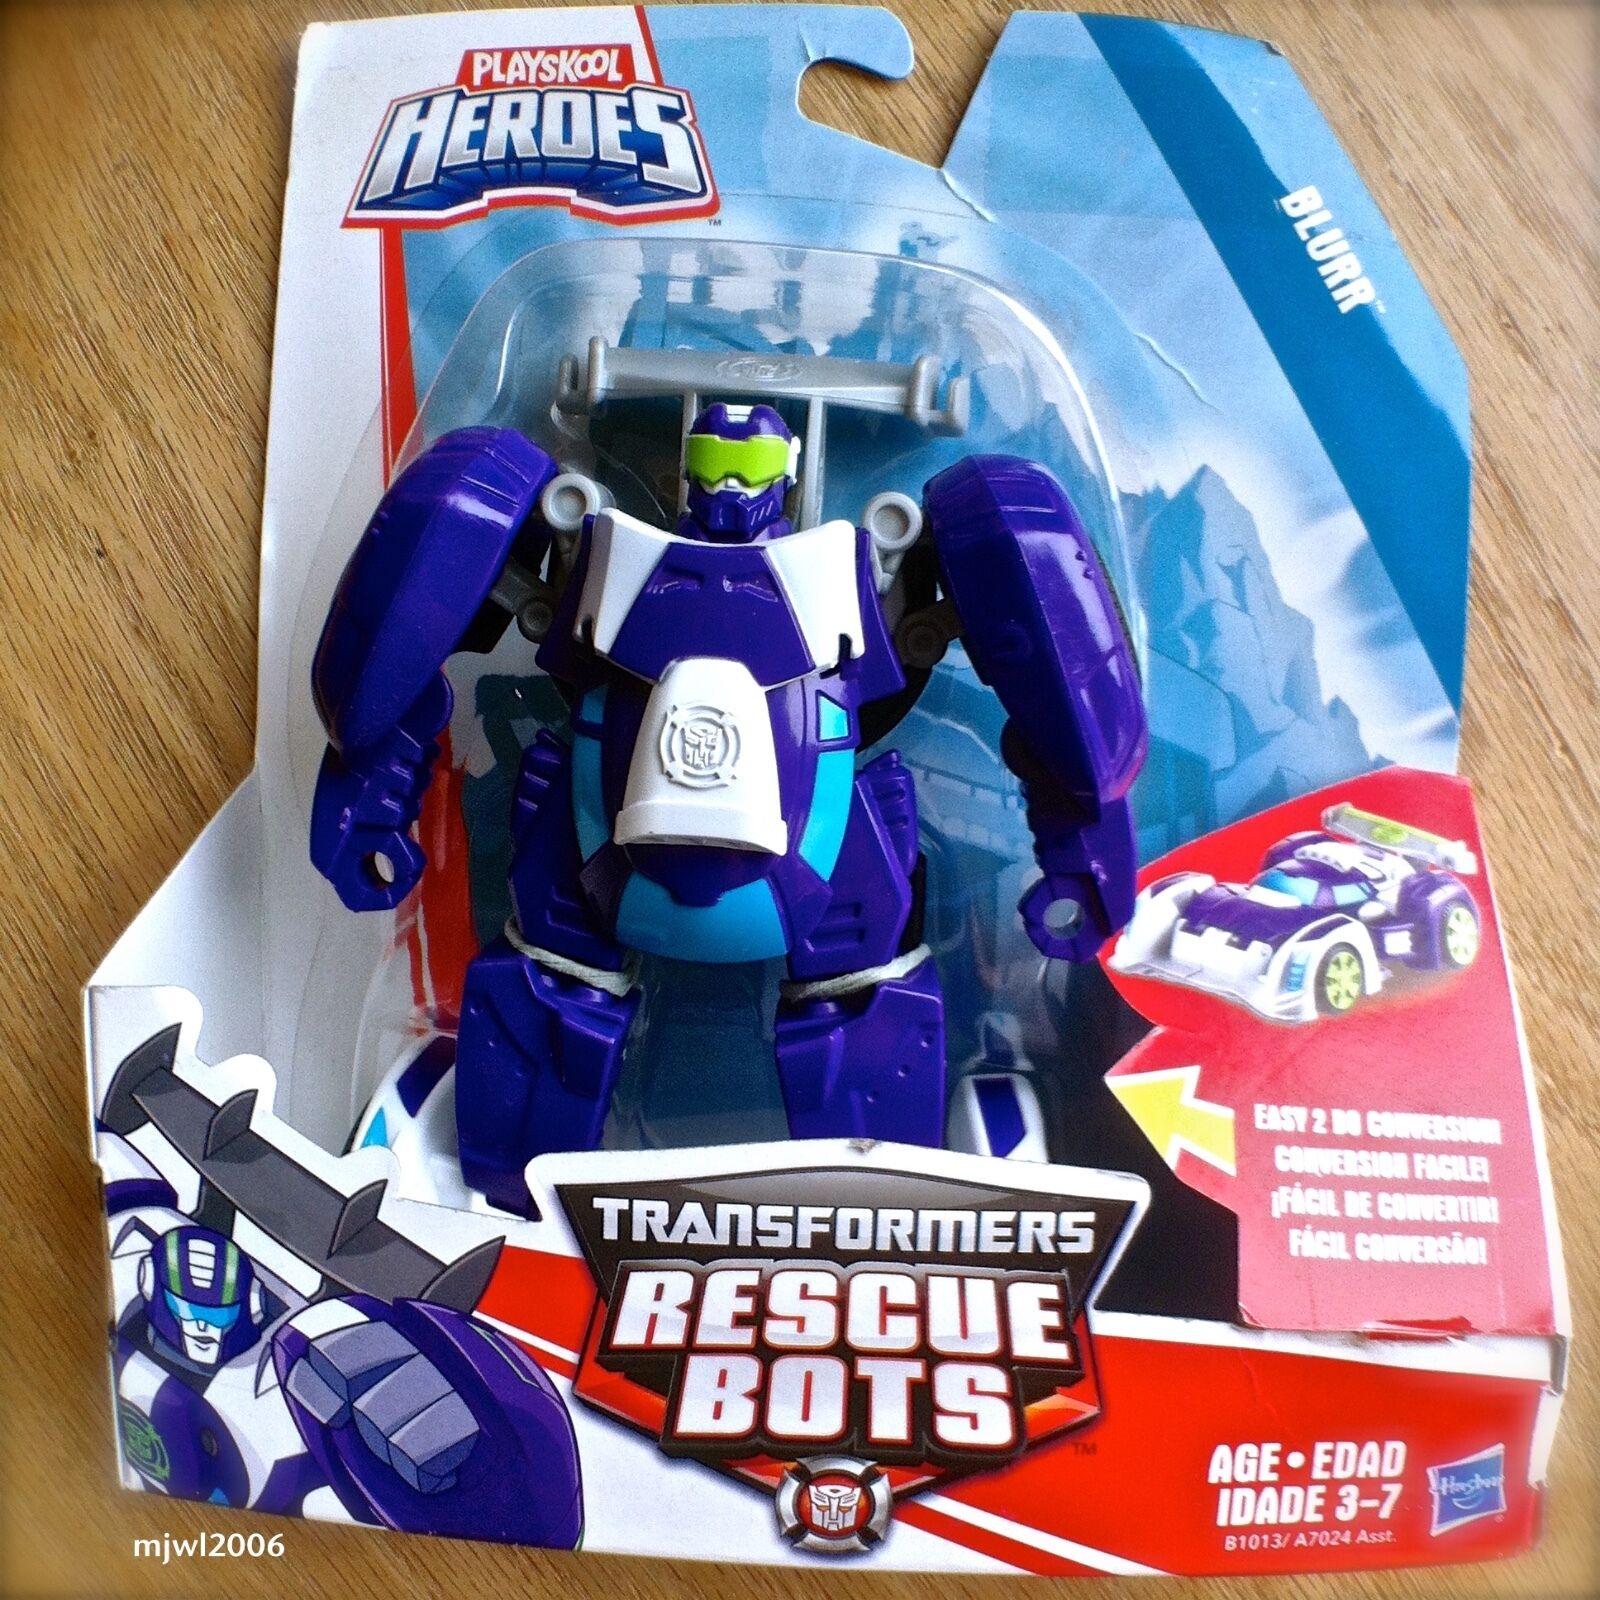 Transformers RESCUE BOTS BLURR Race Car PLAYSKOOL HEROES Hasbro lila NEW